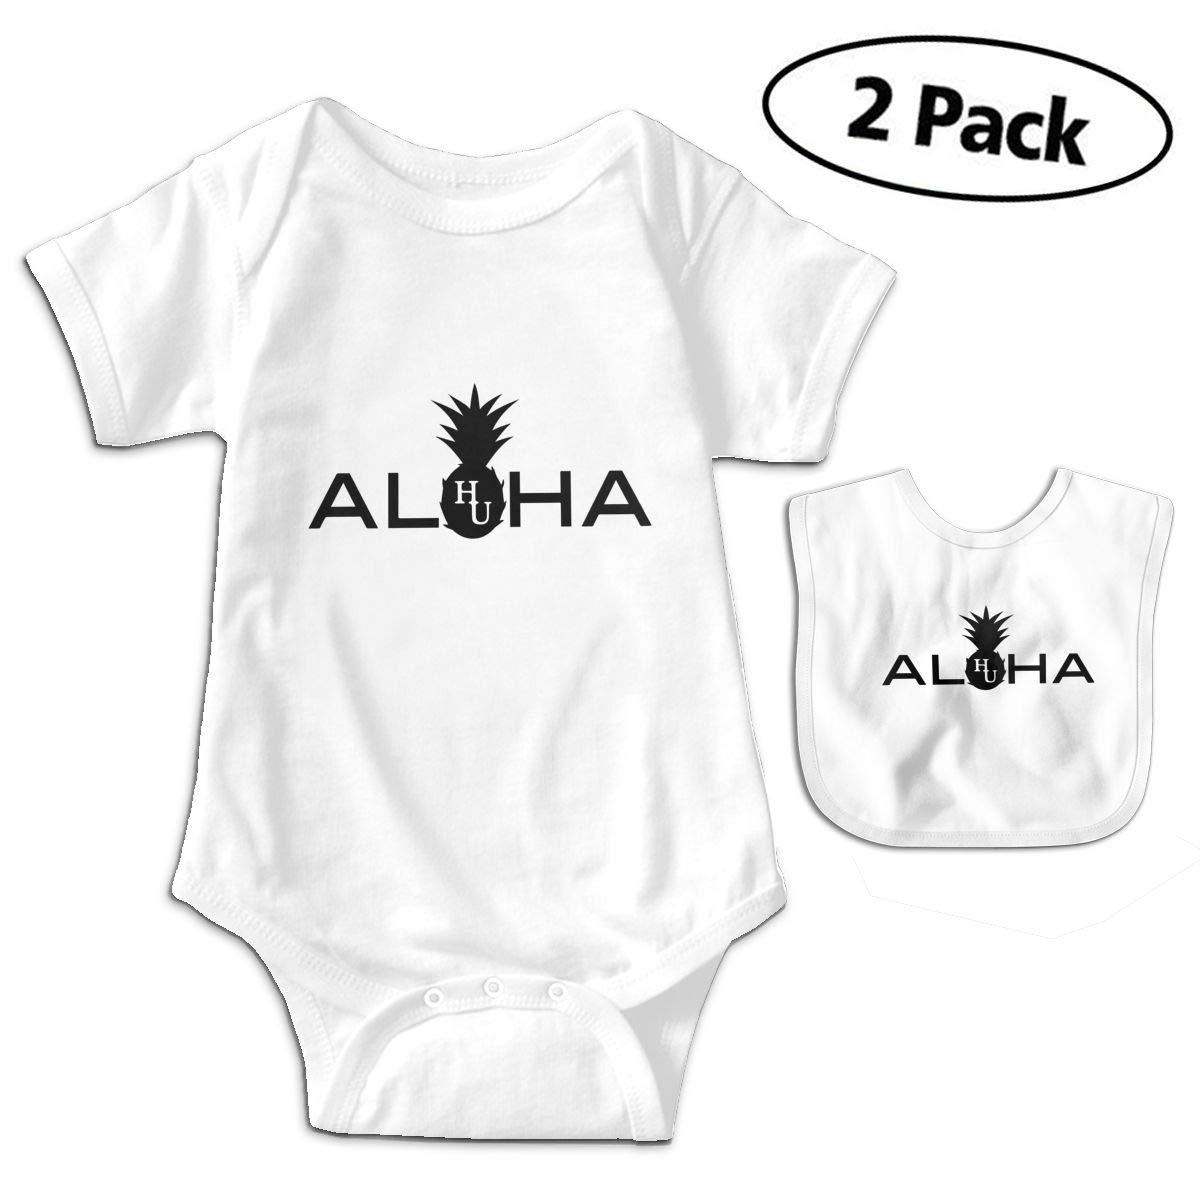 Hawaii Unchained Aloha Infant Baby Short Sleeve Romper Jumpsuit Bodysuit